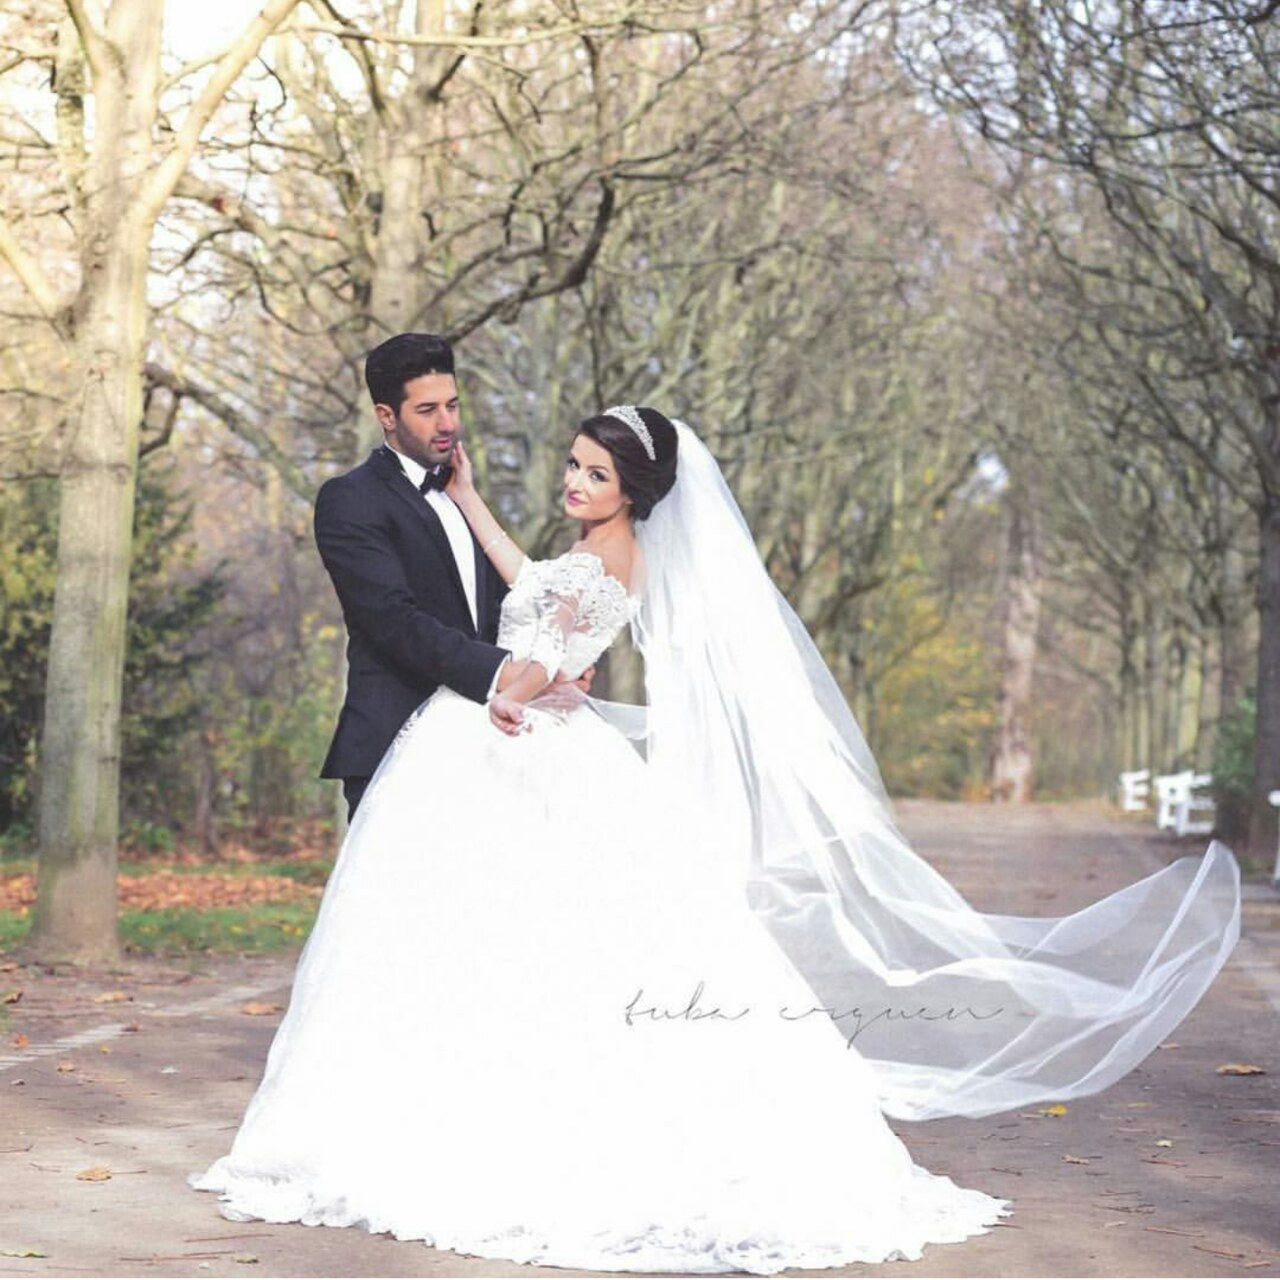 بالصور اجمل صور عرسان , شاهد بالصور اجمل البومات الصور للعرسان 430 12